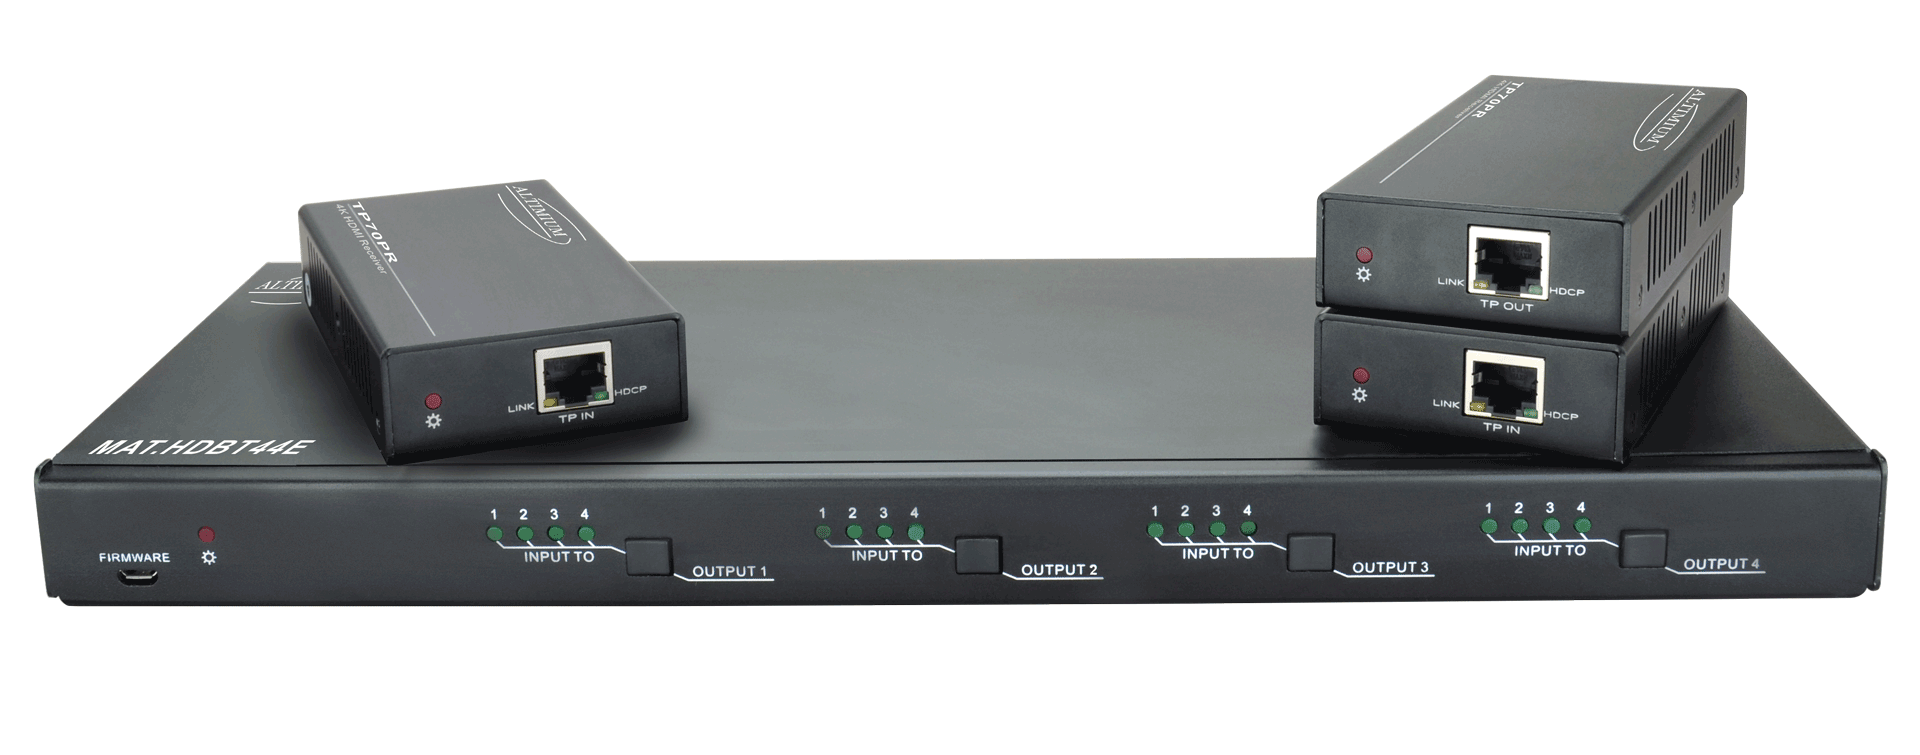 MAT.HDBT44E - Matrice 44 hybride HDBaseT 4 entrées HDMI avec 3 Récepteurs fournis